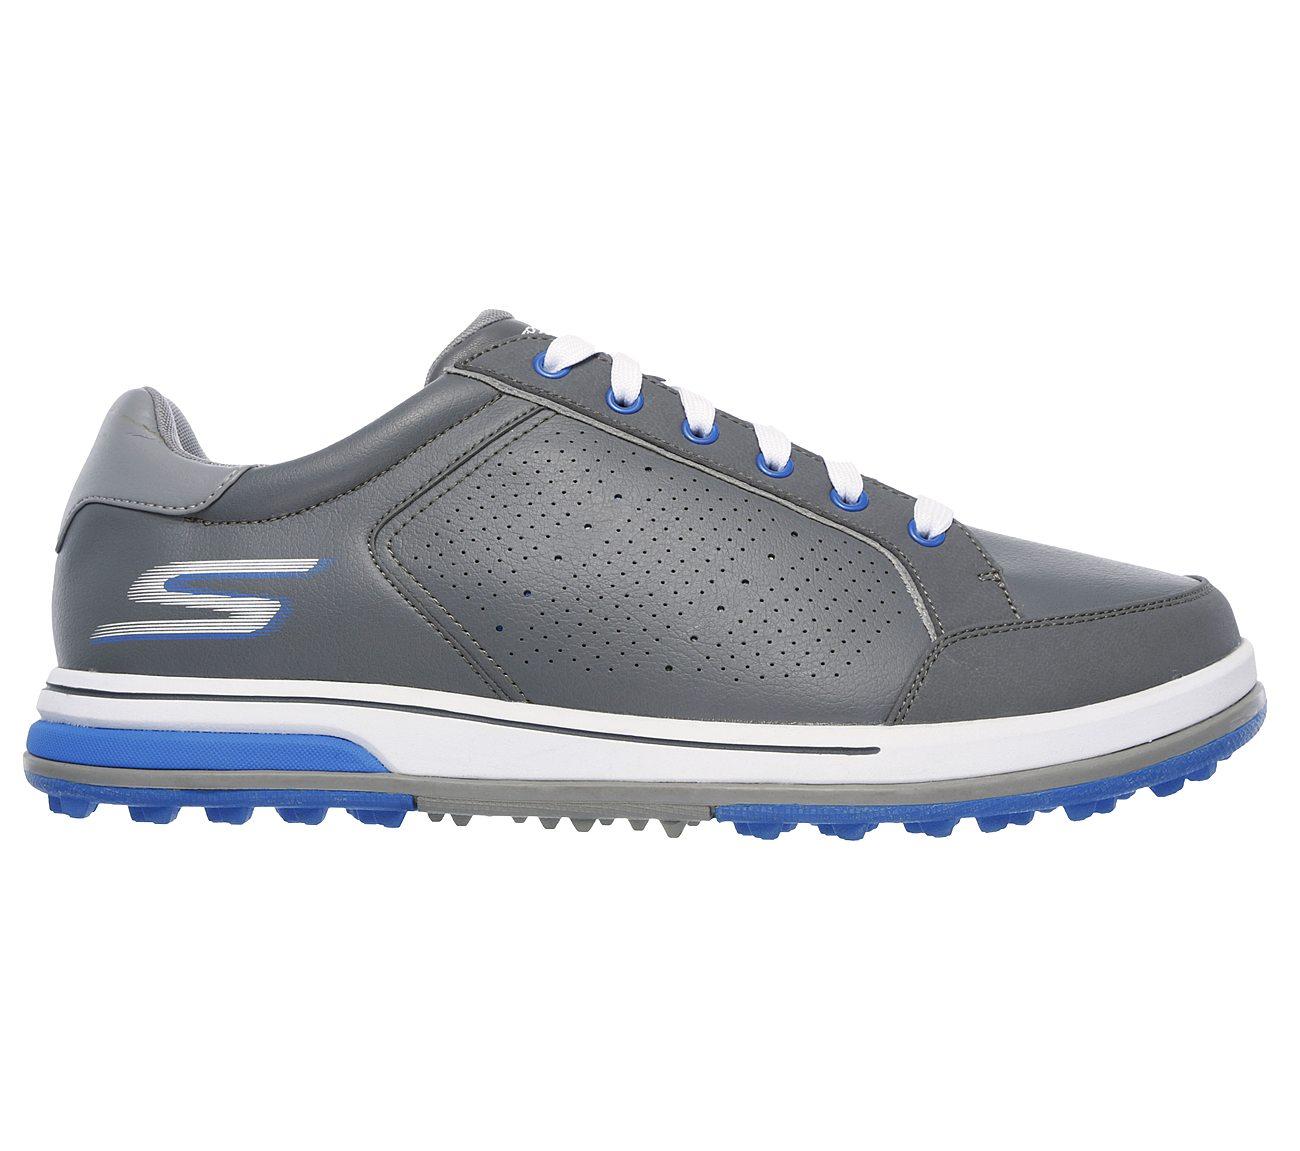 Skechers Men's Go Golf Drive 2 Lx Golf Shoe